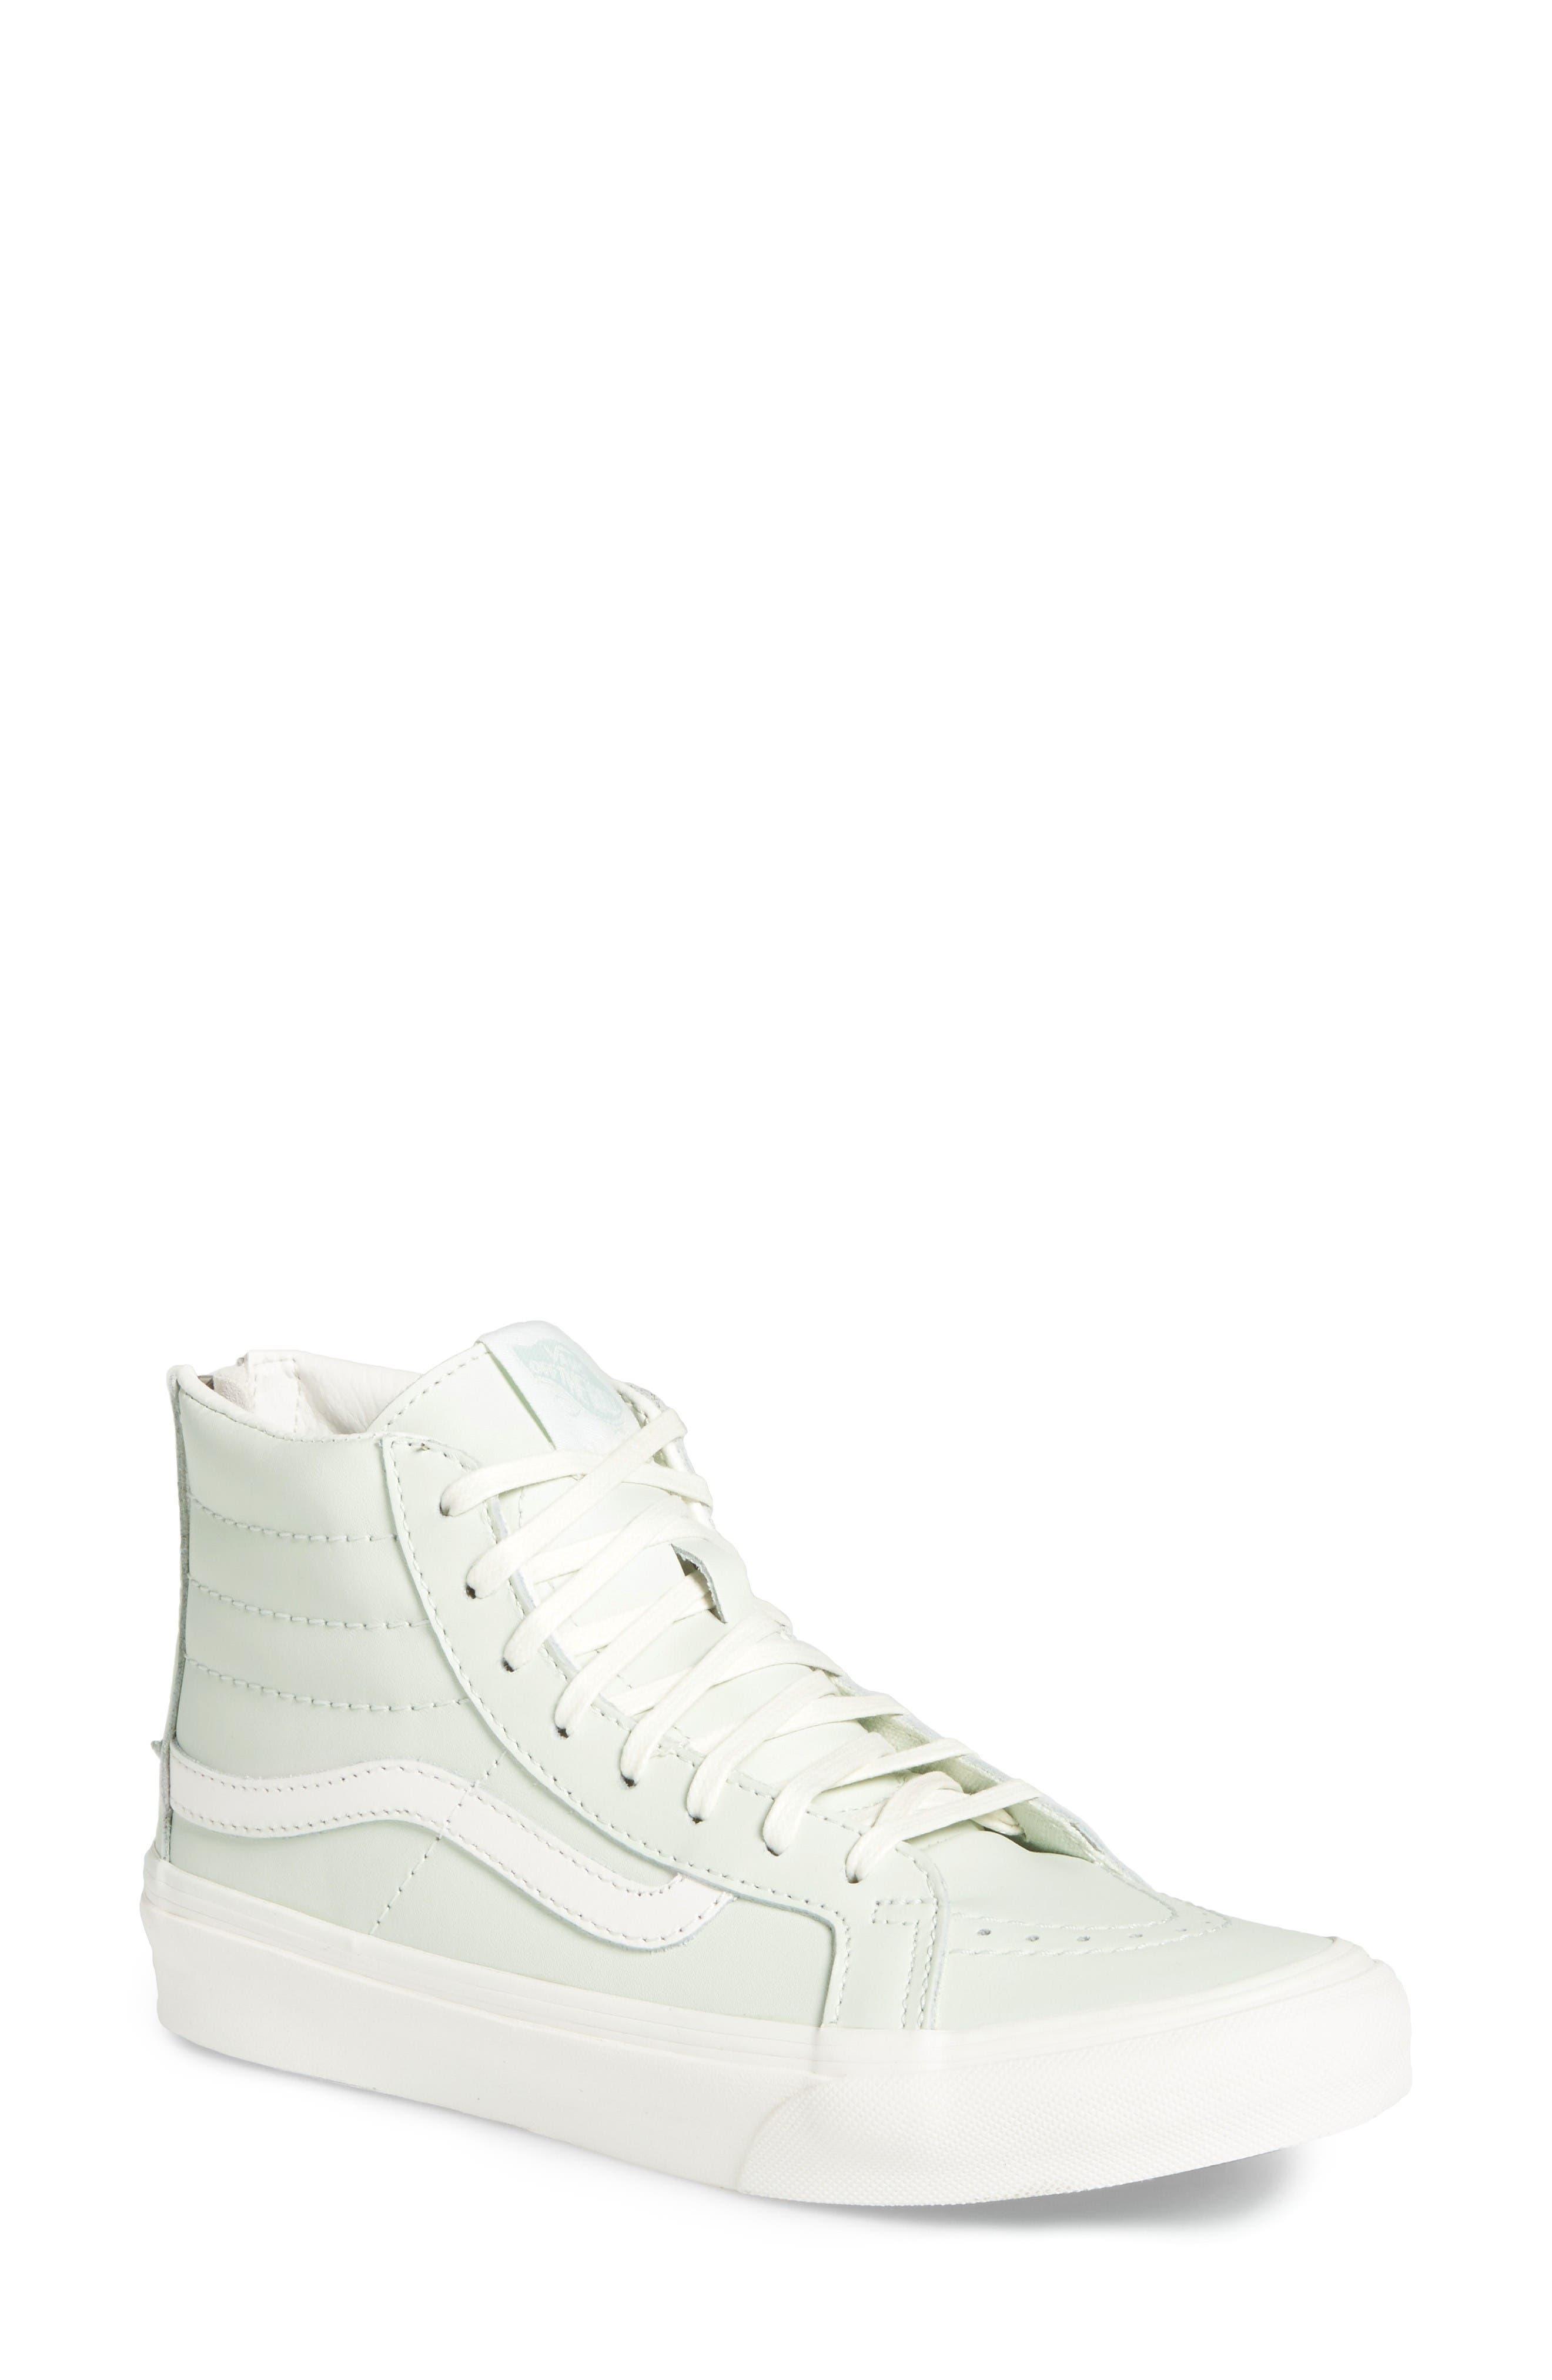 Alternate Image 1 Selected - Vans 'Sk8-Hi' Slim Zip Sneaker (Women)